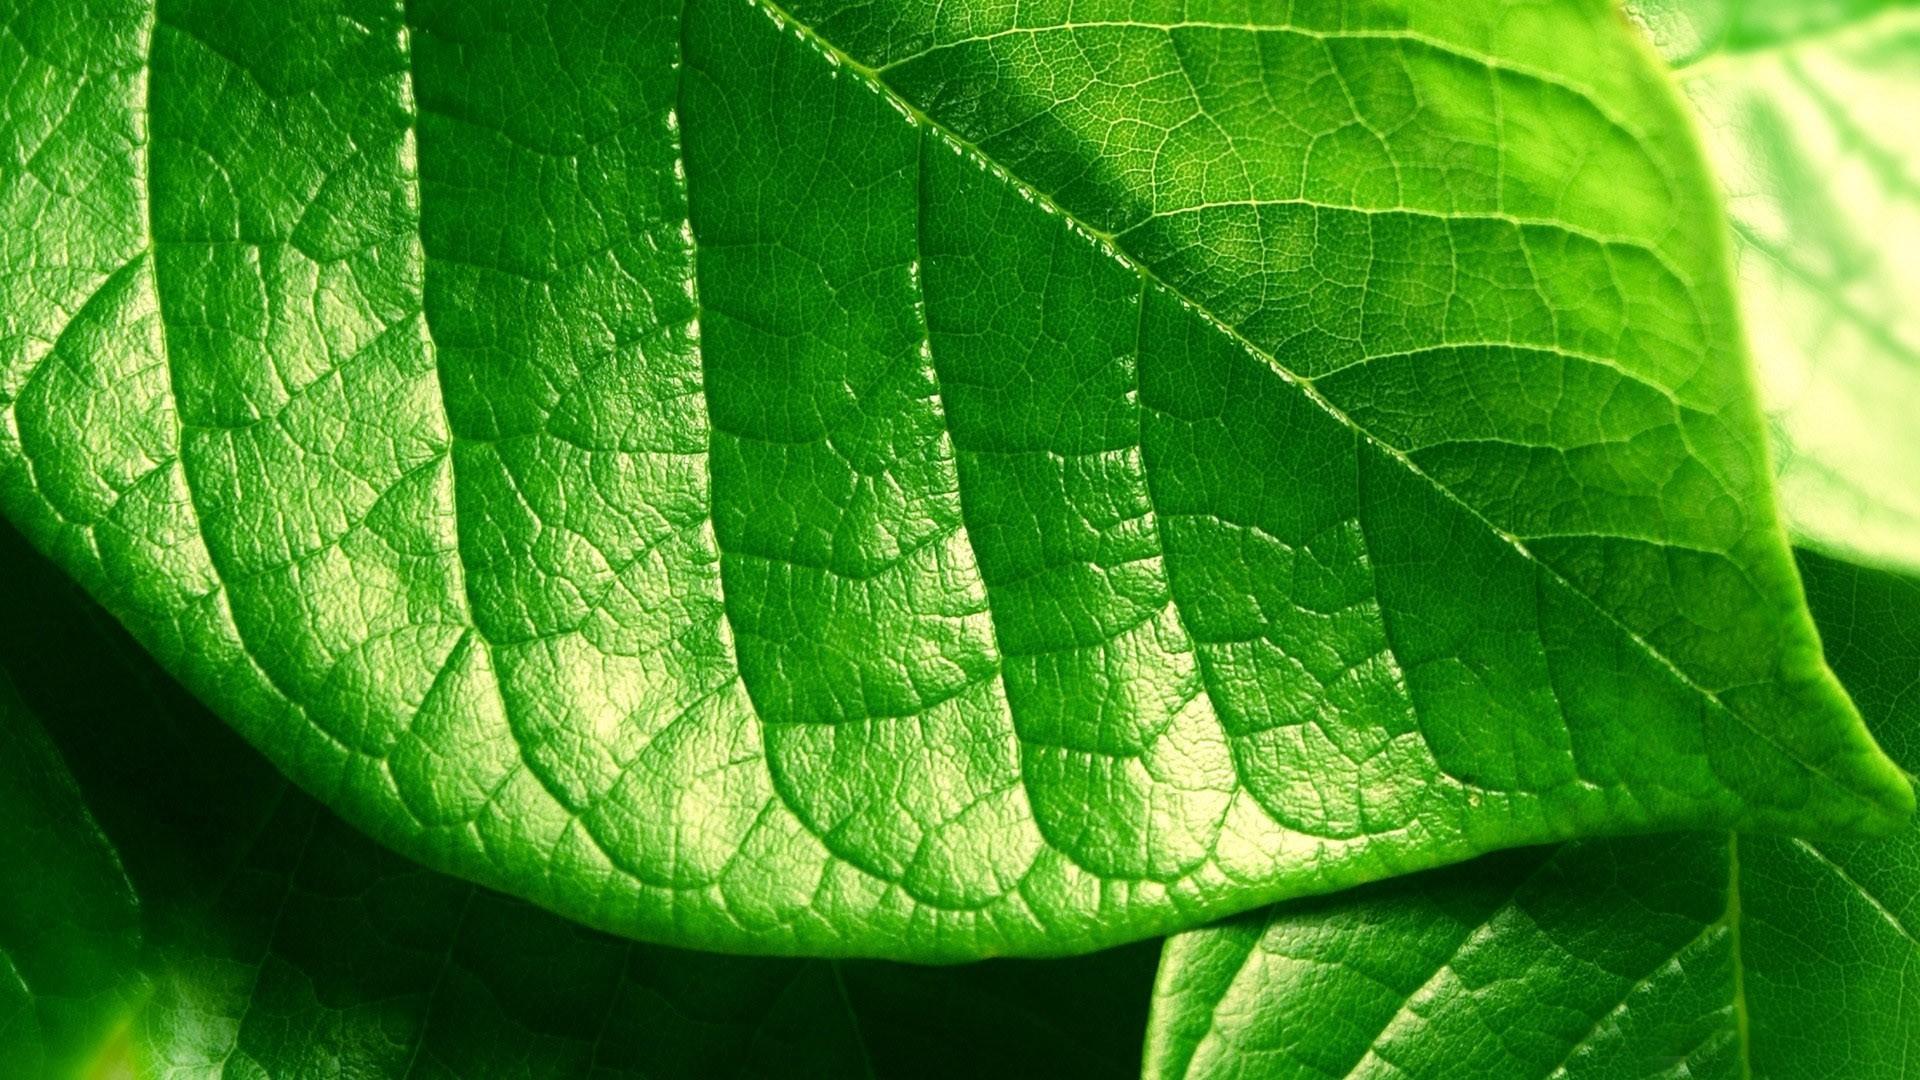 Green leaf wallpaper 11681 1920x1080